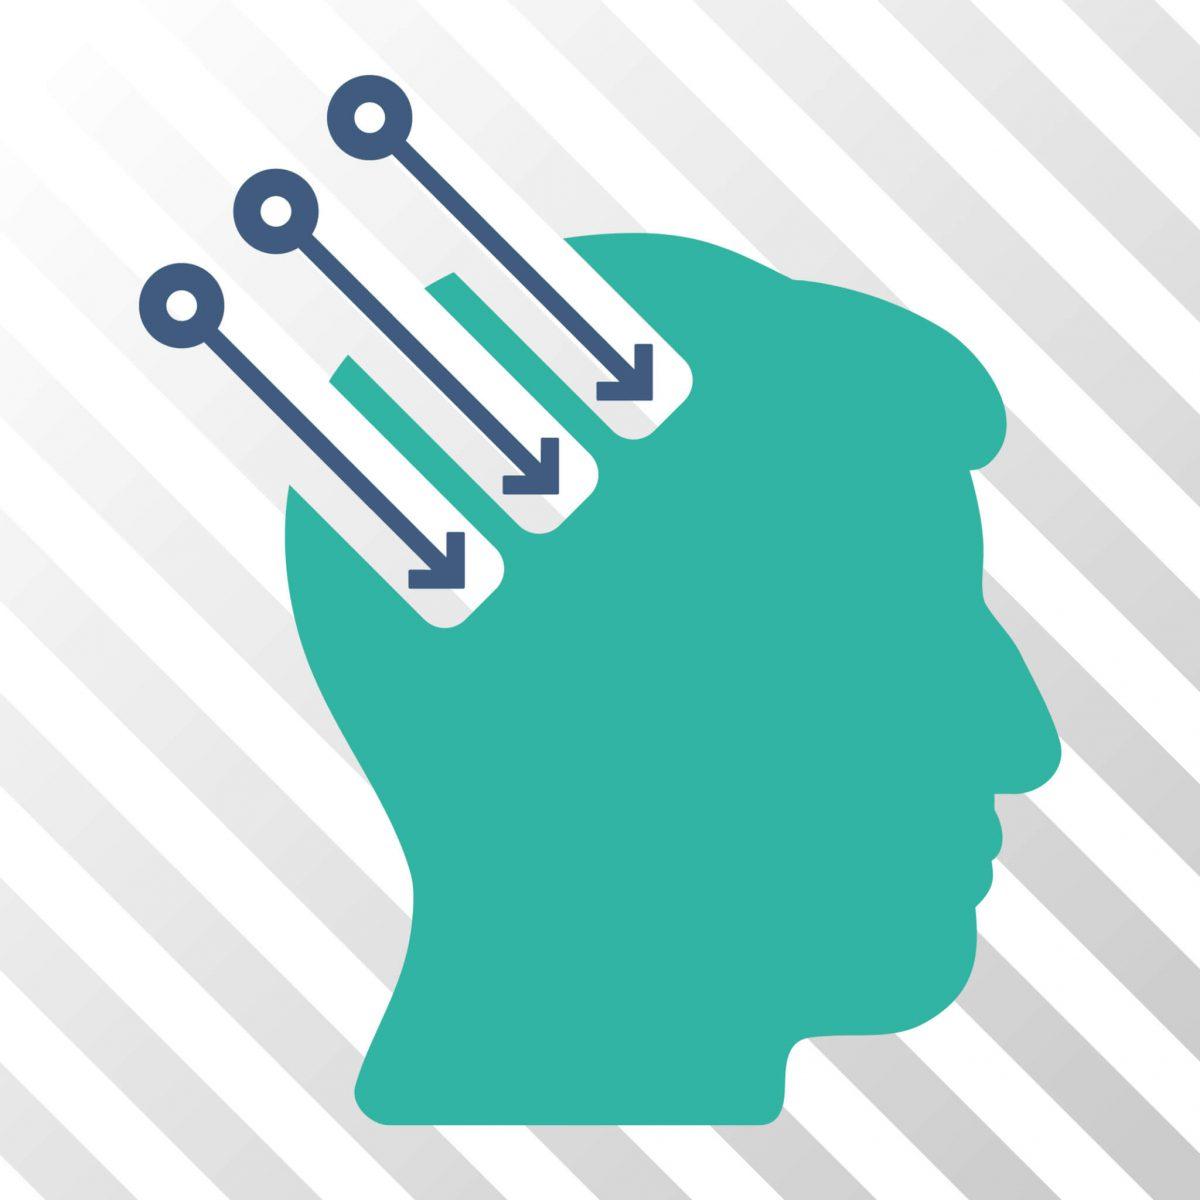 4 Ai Startups That Analyze Customer Reviews Venturebeat